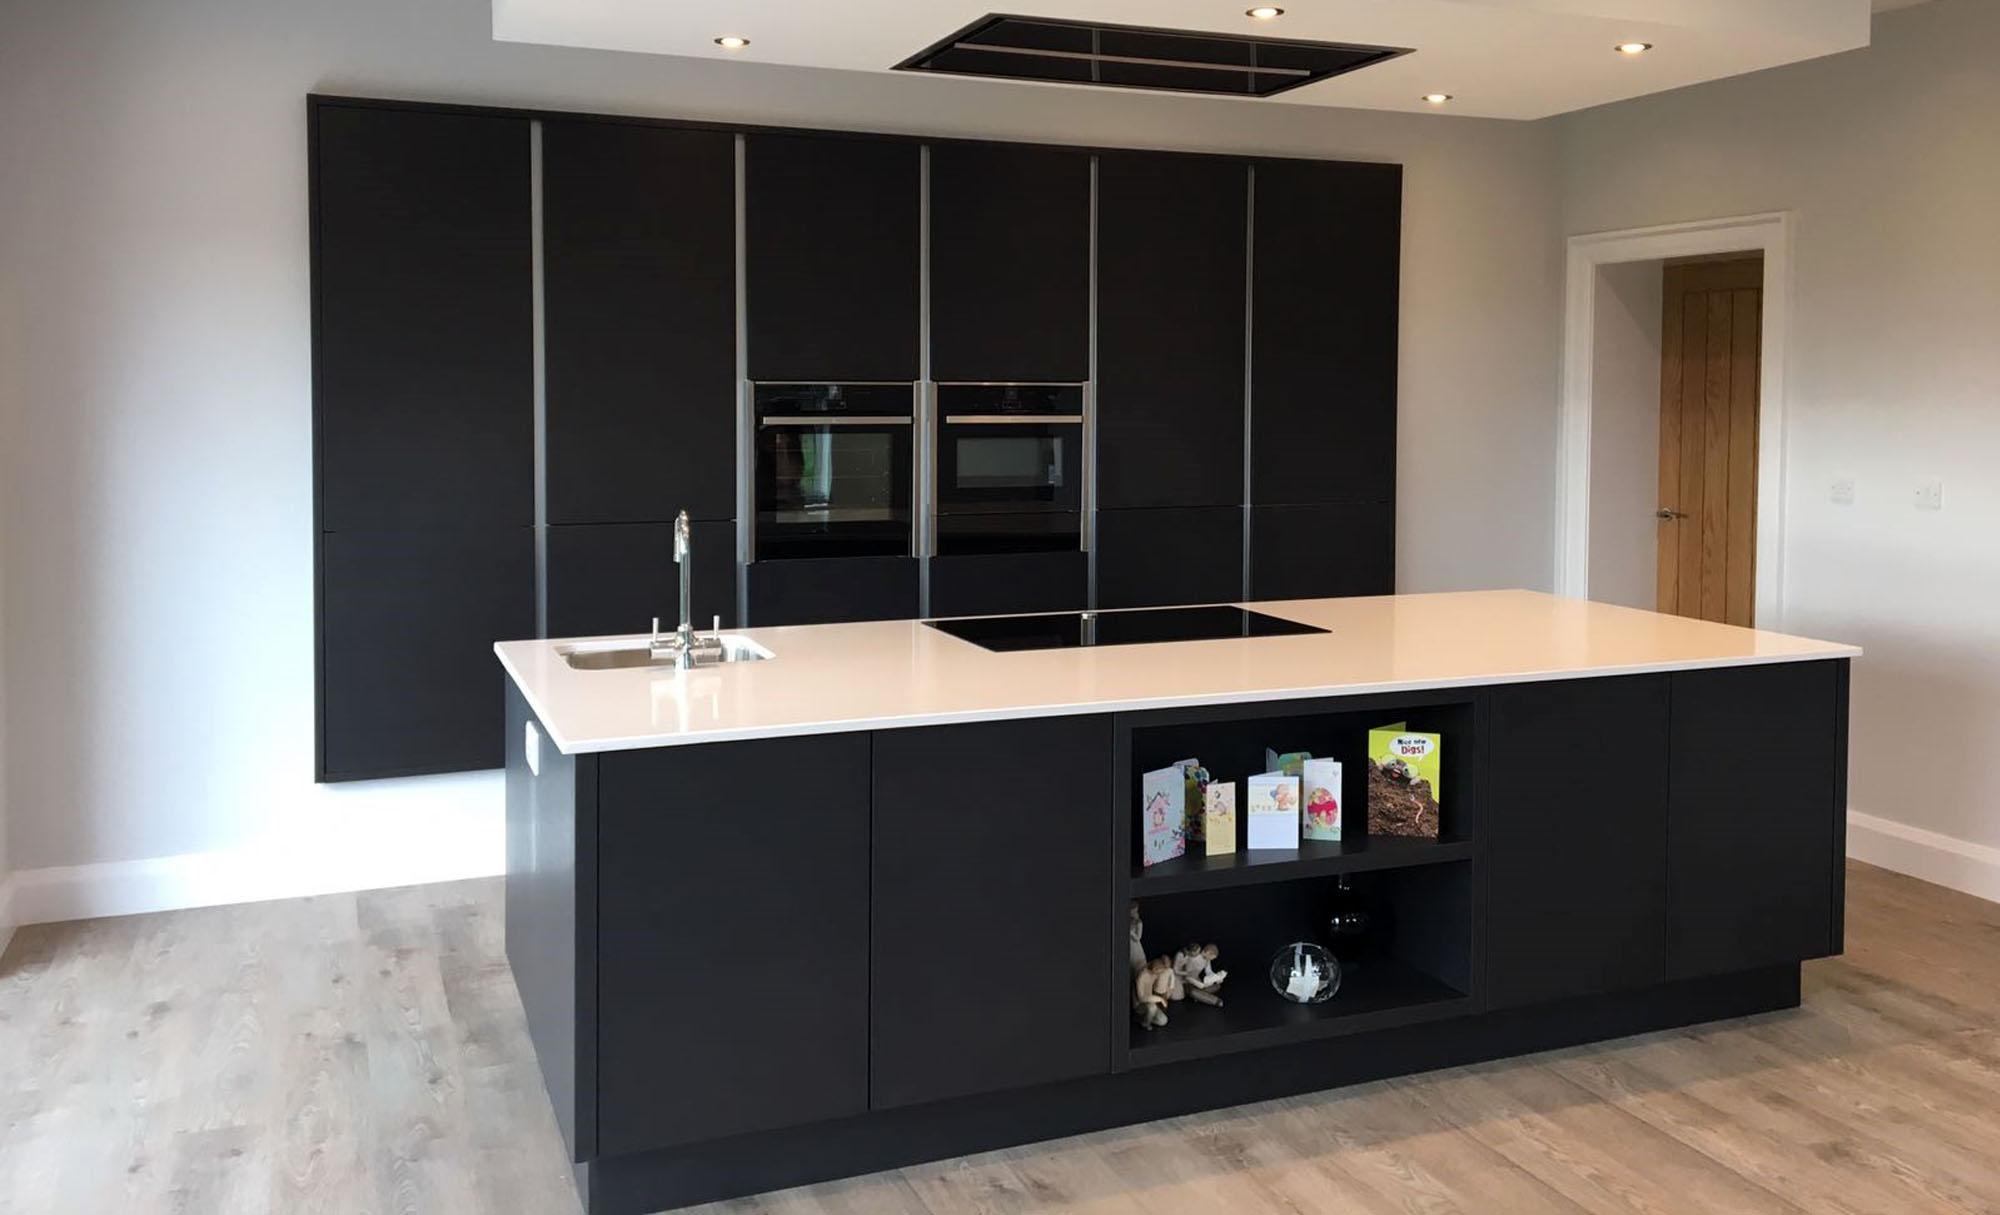 tavola-hacienda-black-coleraine-modern-kitchen-stori